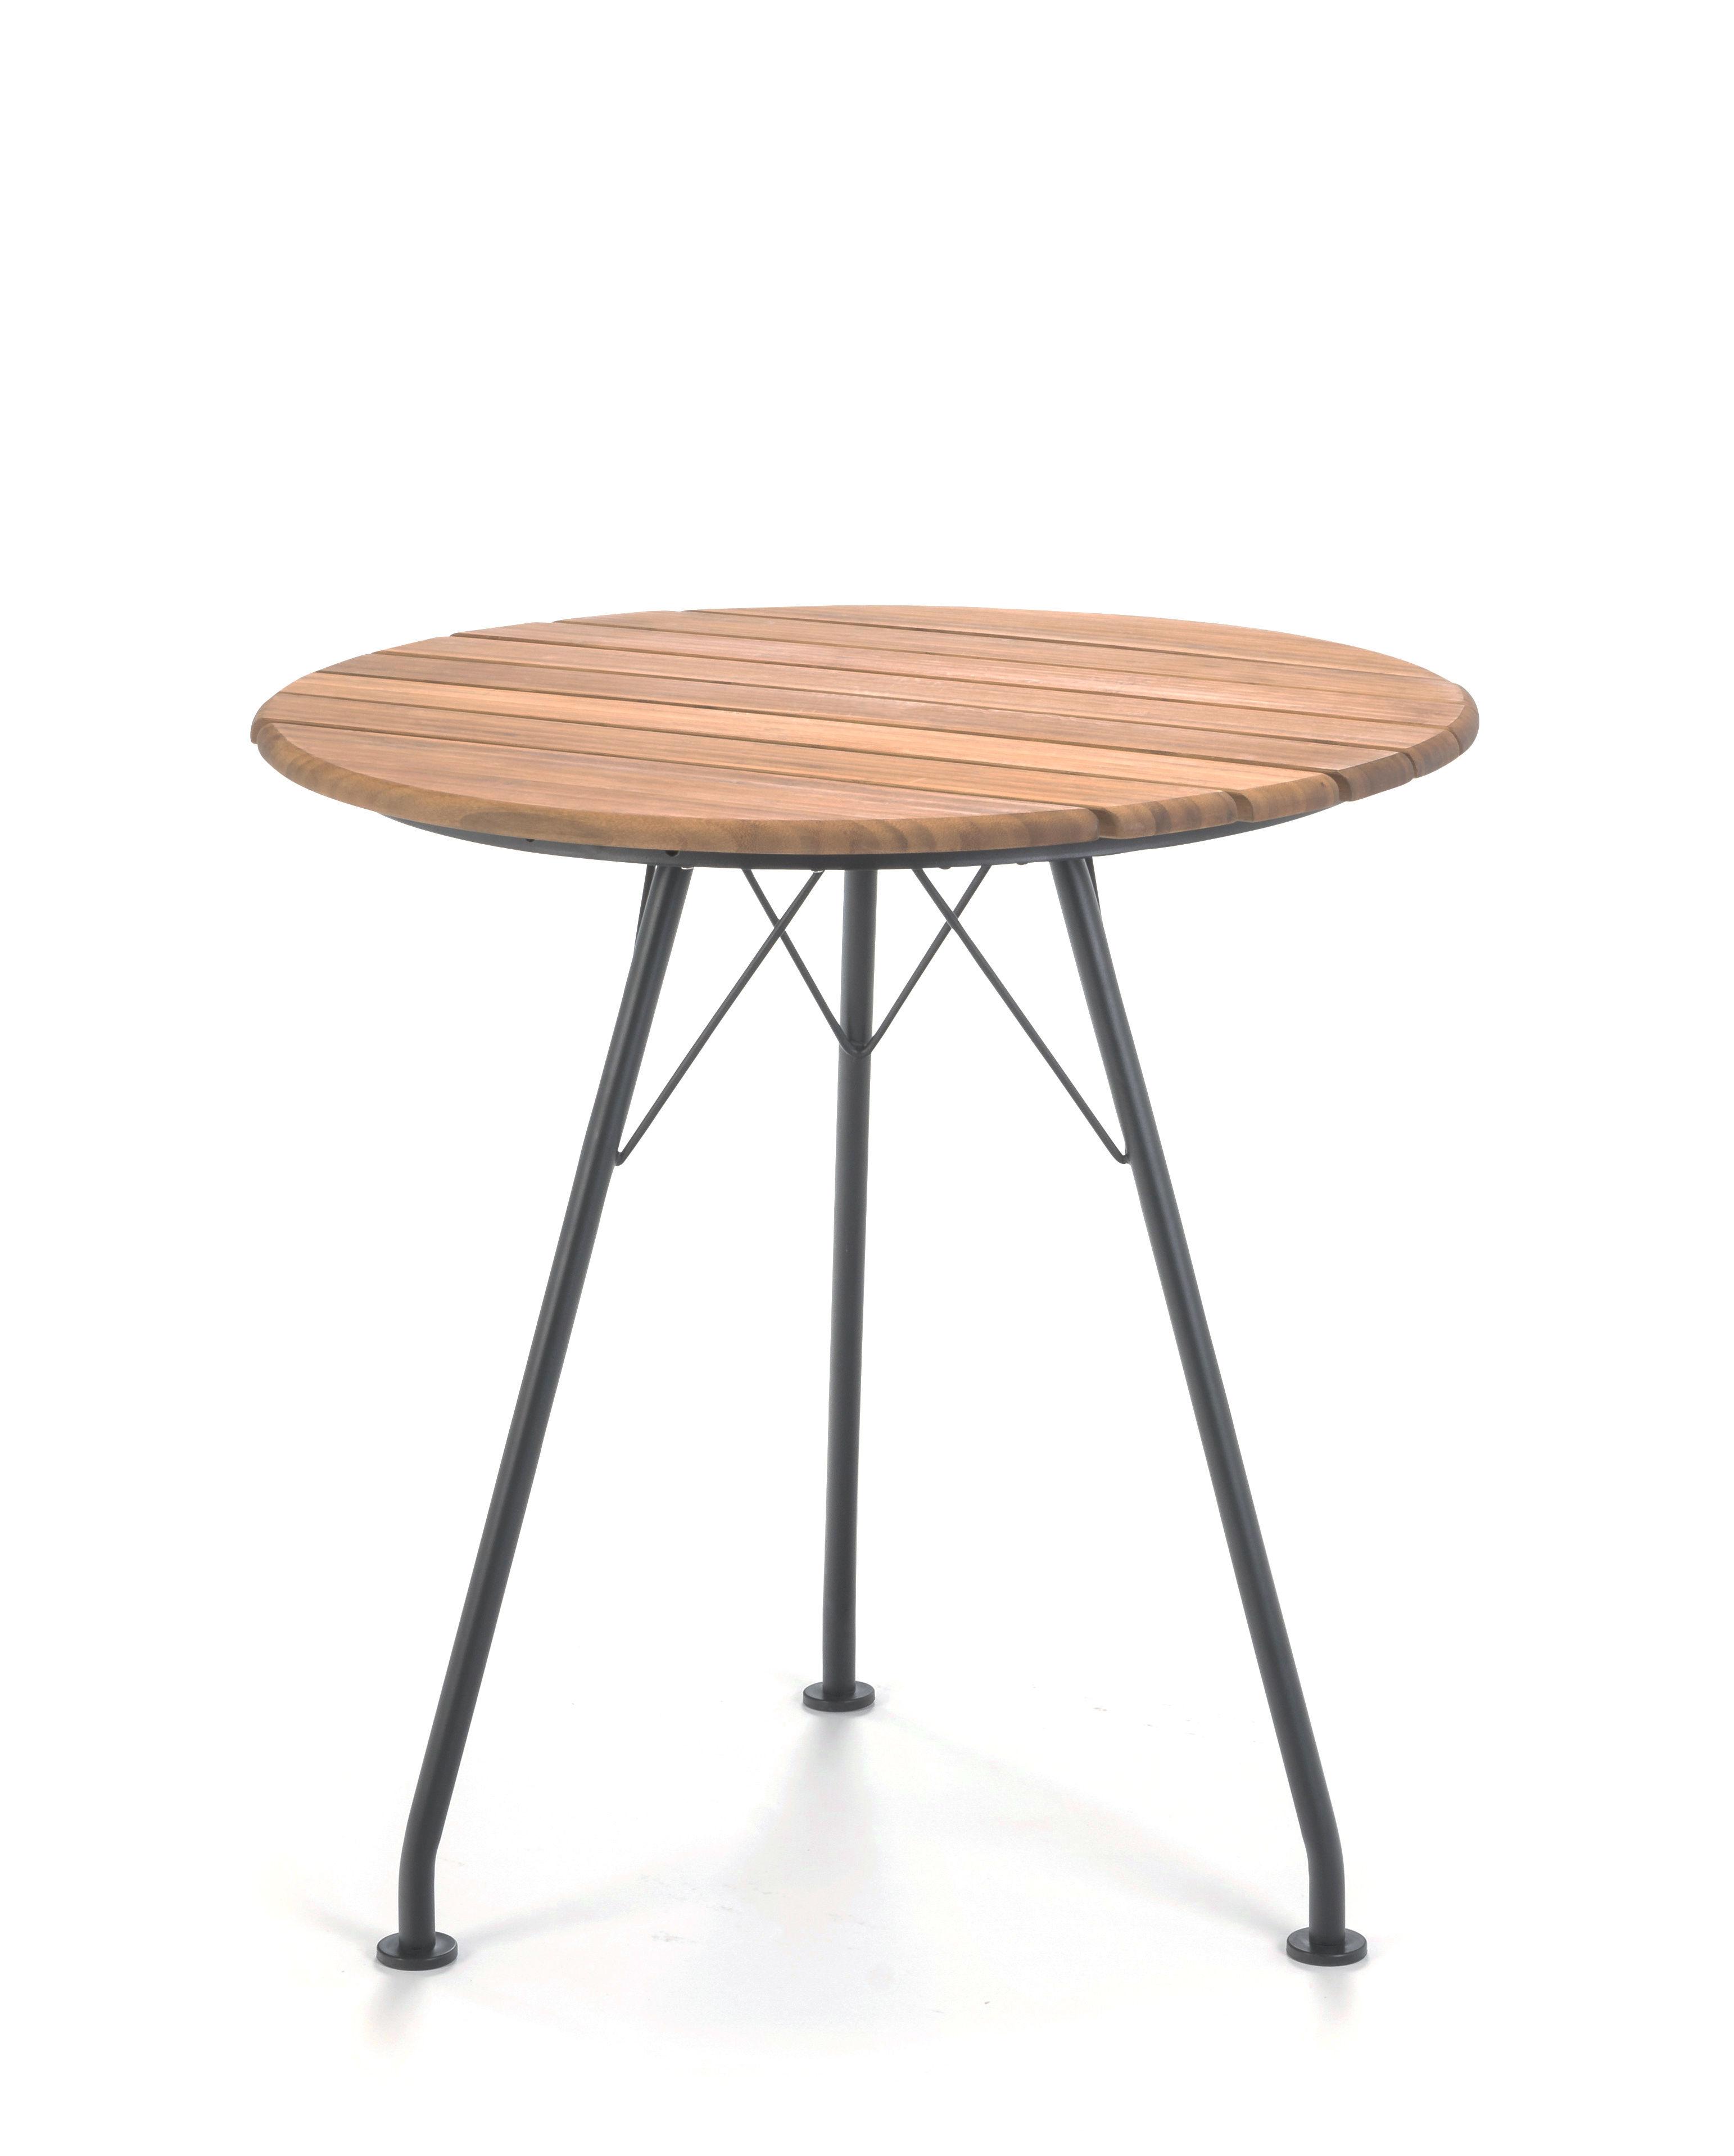 Outdoor - Tavoli  - Tavolo rotondo Circum - / Metallo & bambù - Ø 74 cm di Houe - Bambù & Nero - Acciaio laccato epossidico, Bambù